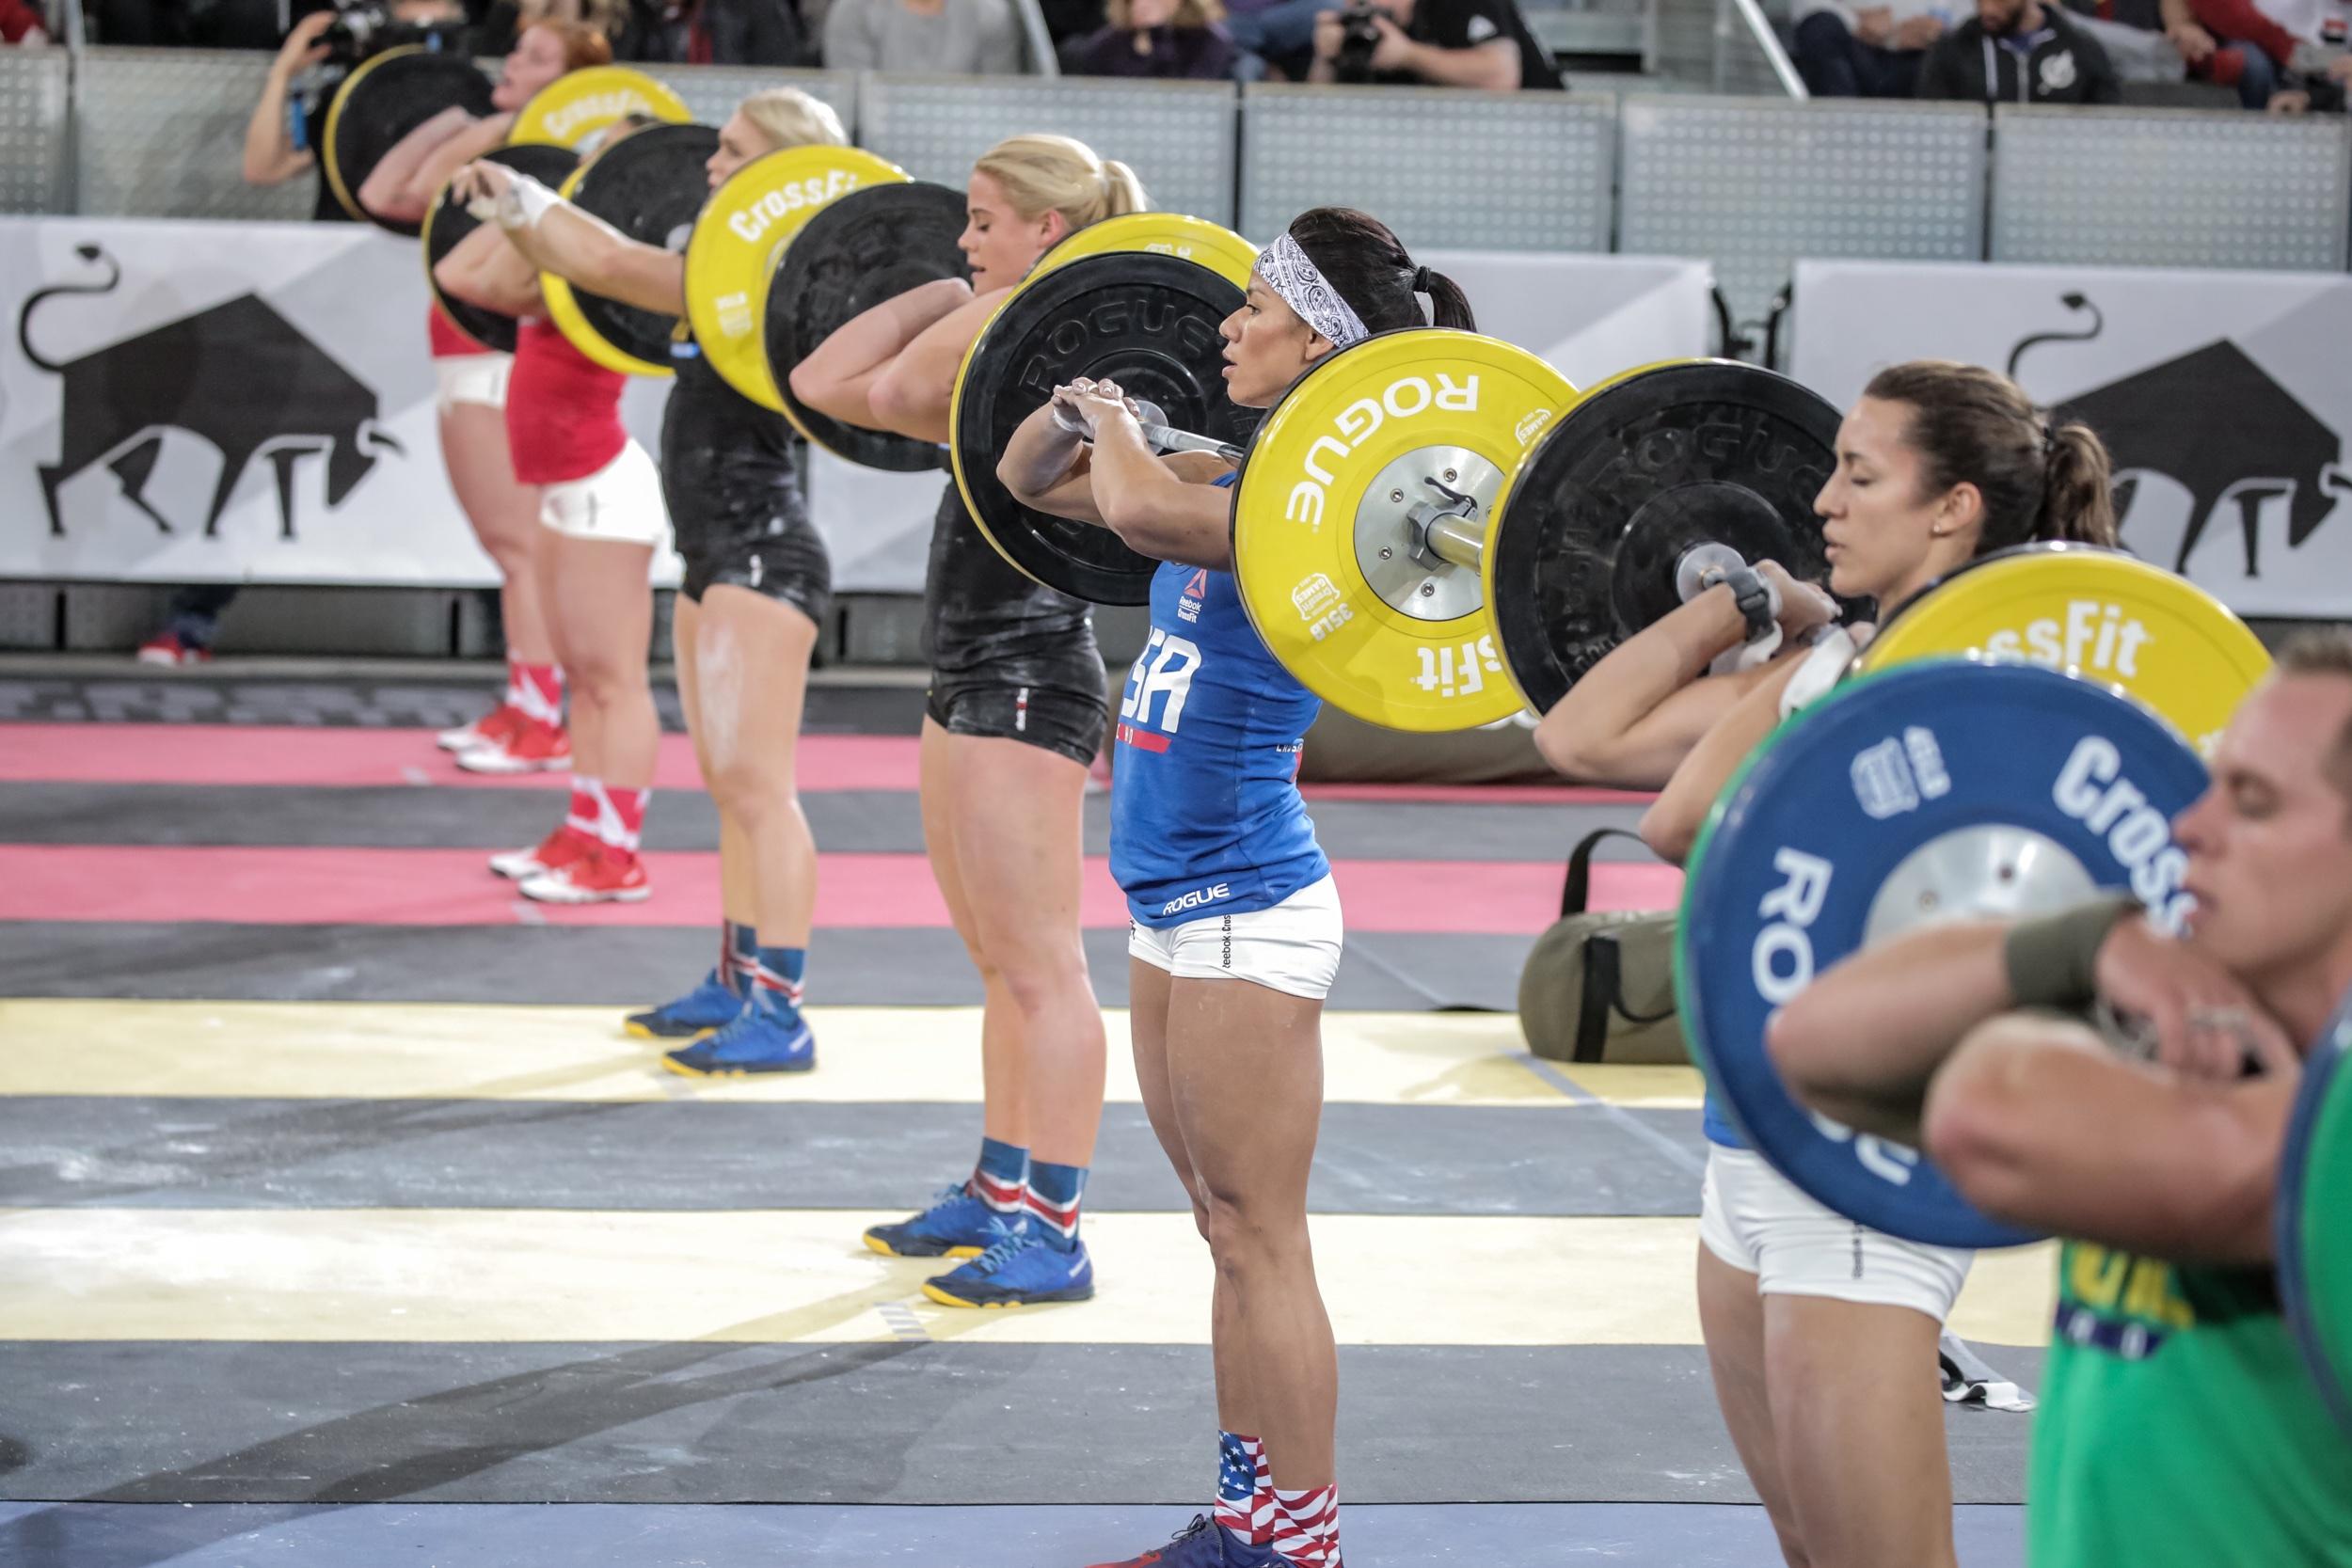 Compte rendu du Reebok CrossFit Invitational 2015